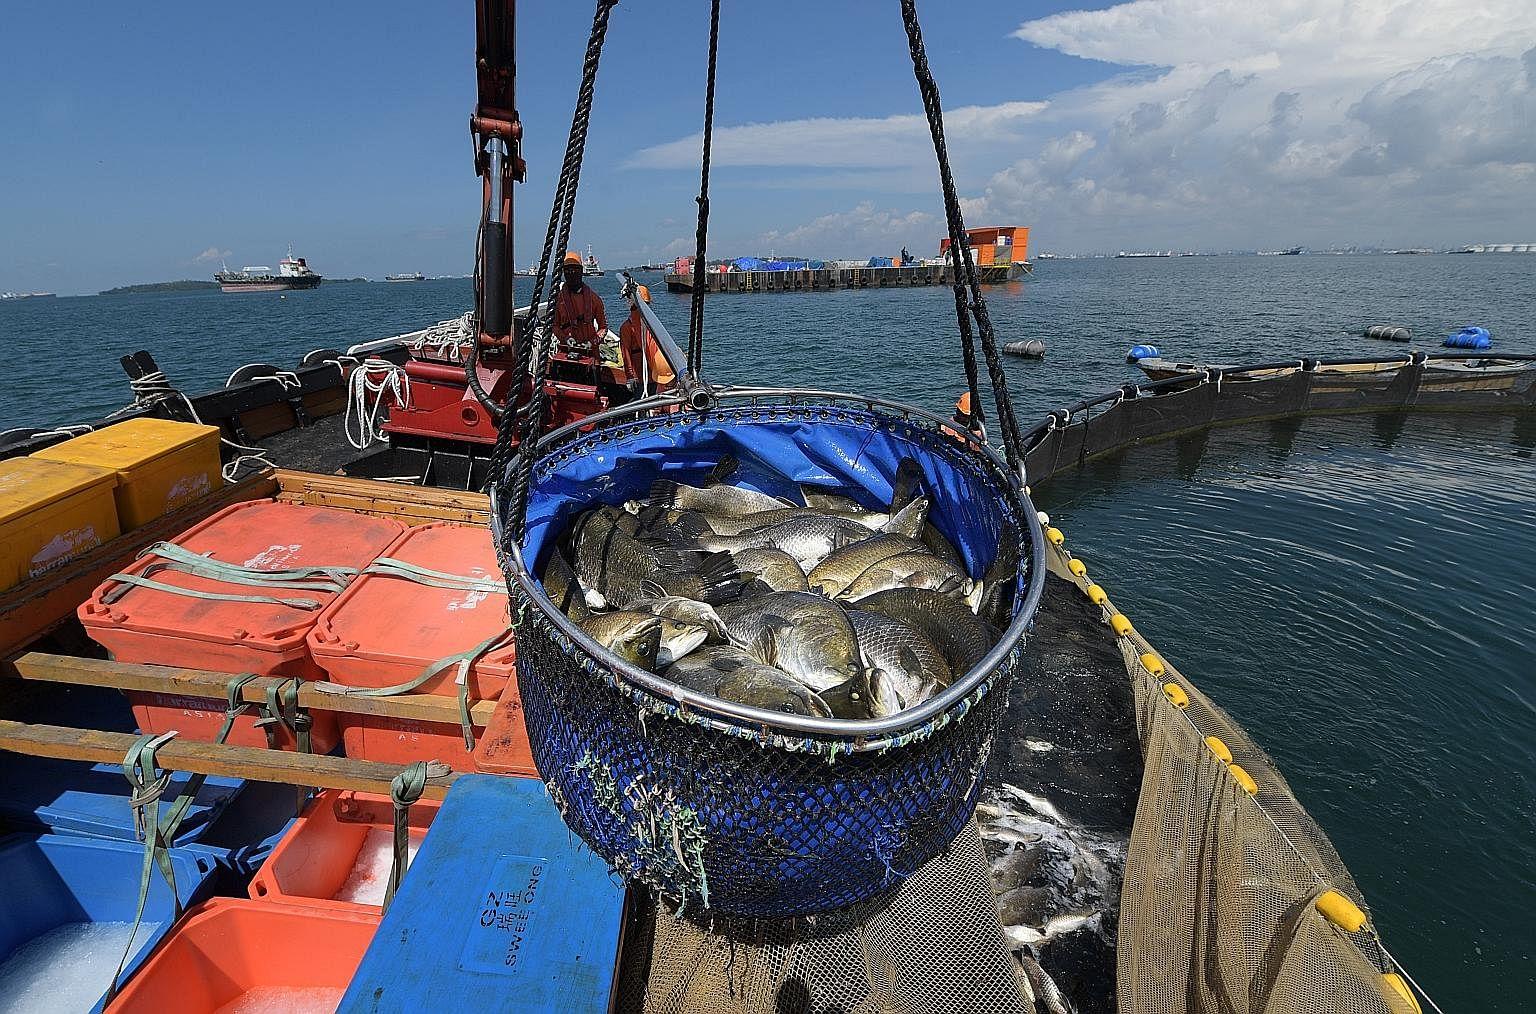 Mr Wong Jing Kai, partner of Ah Hua Kelong, with a lobster that the company rears along with pearl garoupa, seabass, snapper and pomfret at its floating farm off Pulau Ubin and a kelong off Sembawang. Barramundi at the Kuhlbarra fish farm off Pulau S